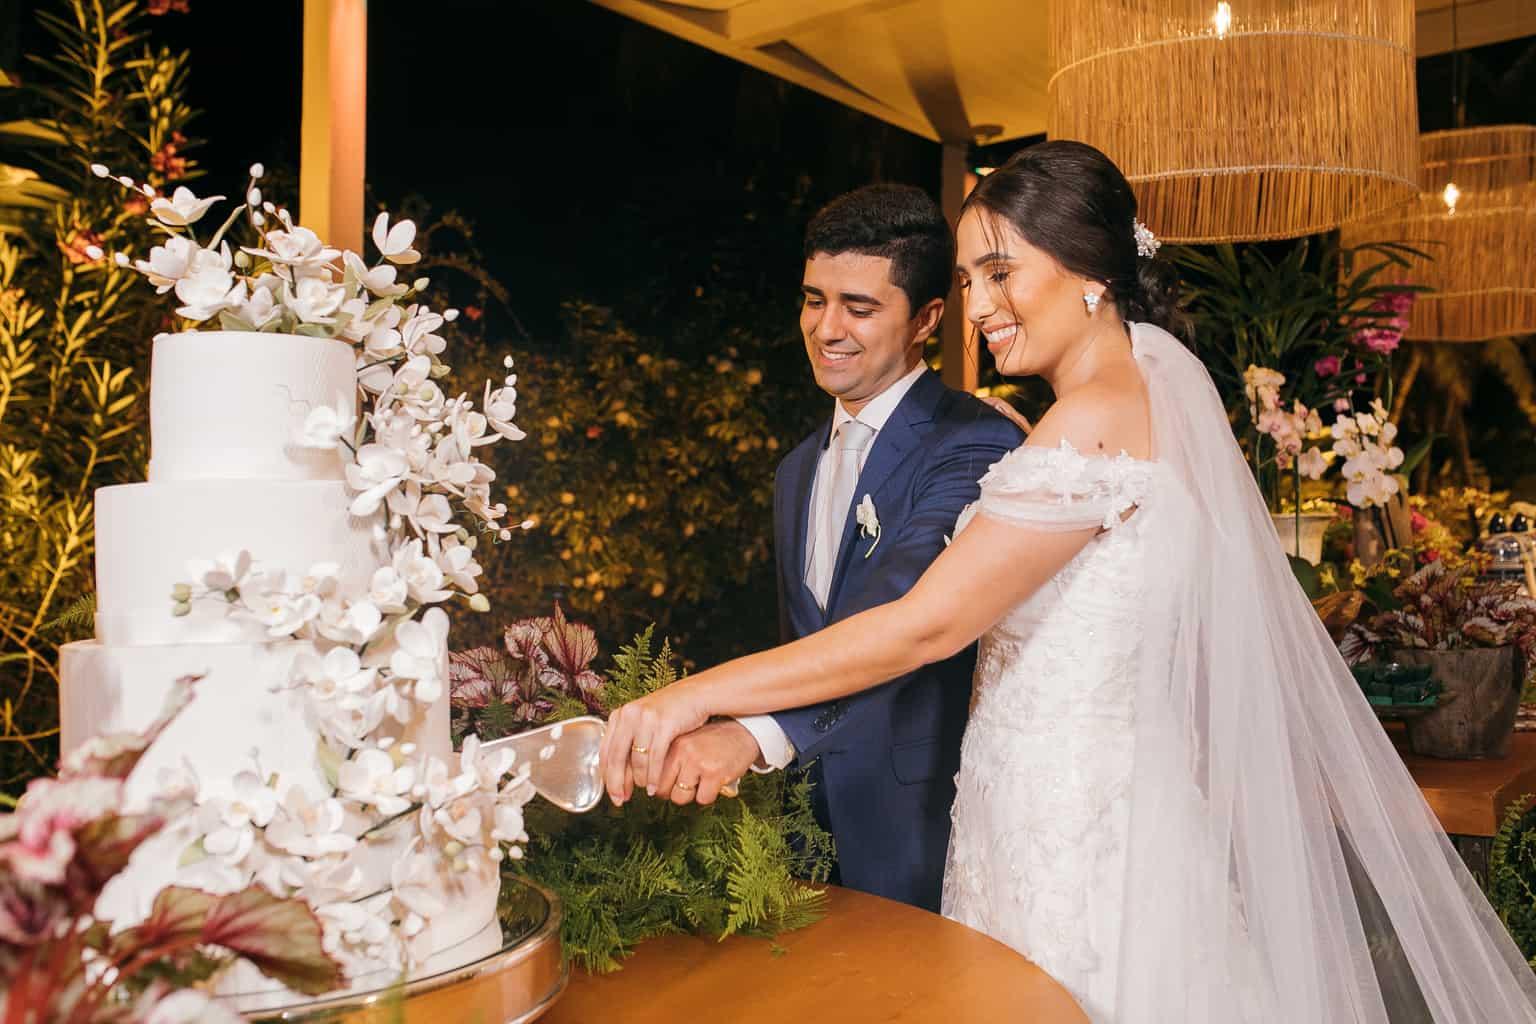 Casamento-Gardenia-e-Marcos-Antonio-Paulo-Bezerra-Joao-Curvelo-Carol-Maiorano1455